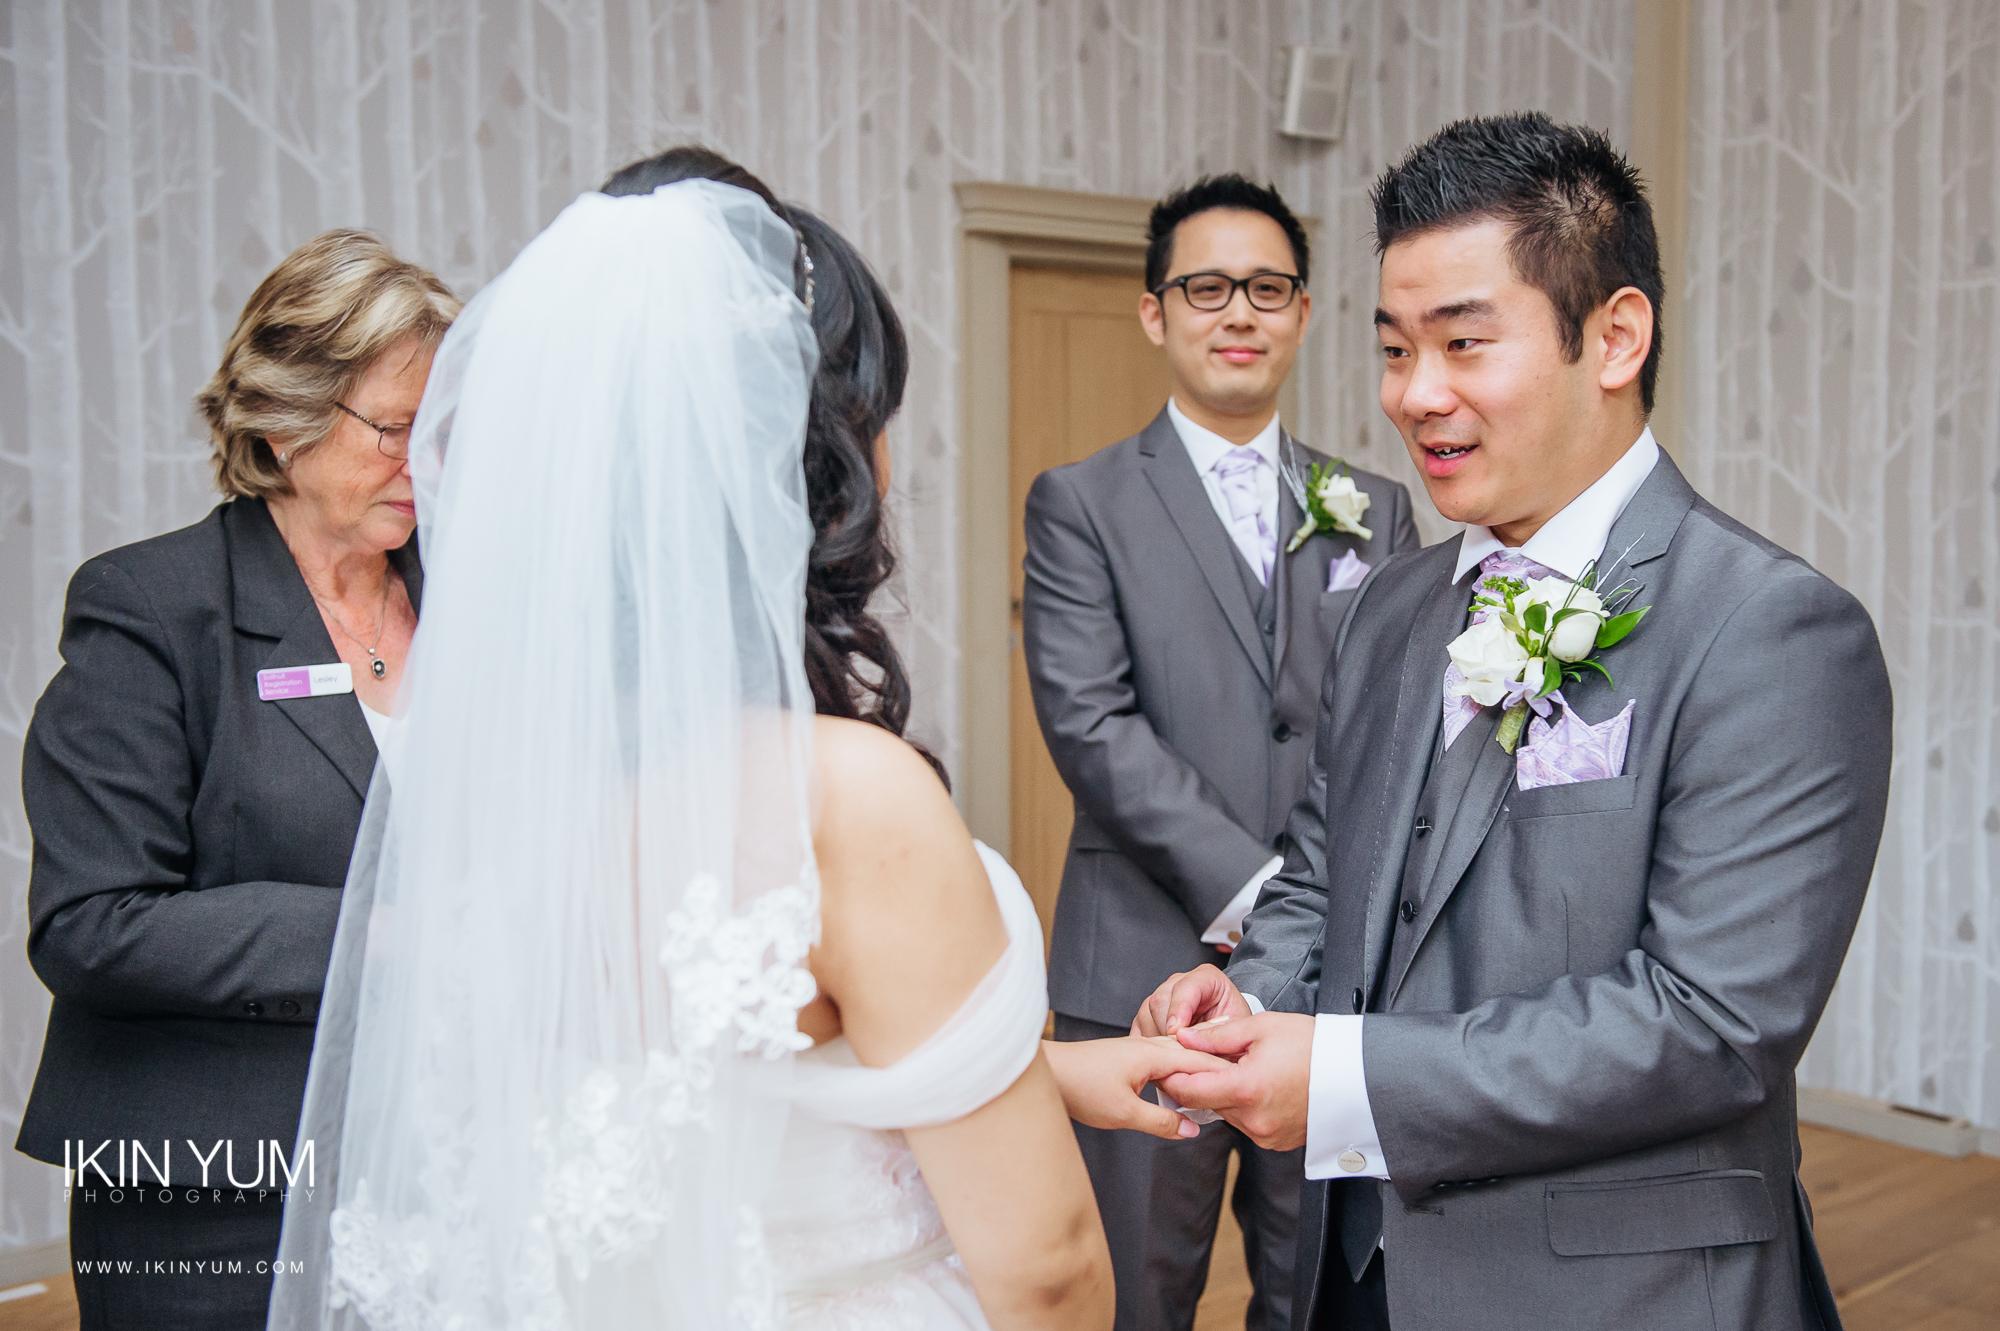 Hampton Manor Wedding - Ikin Yum Photography -080.jpg